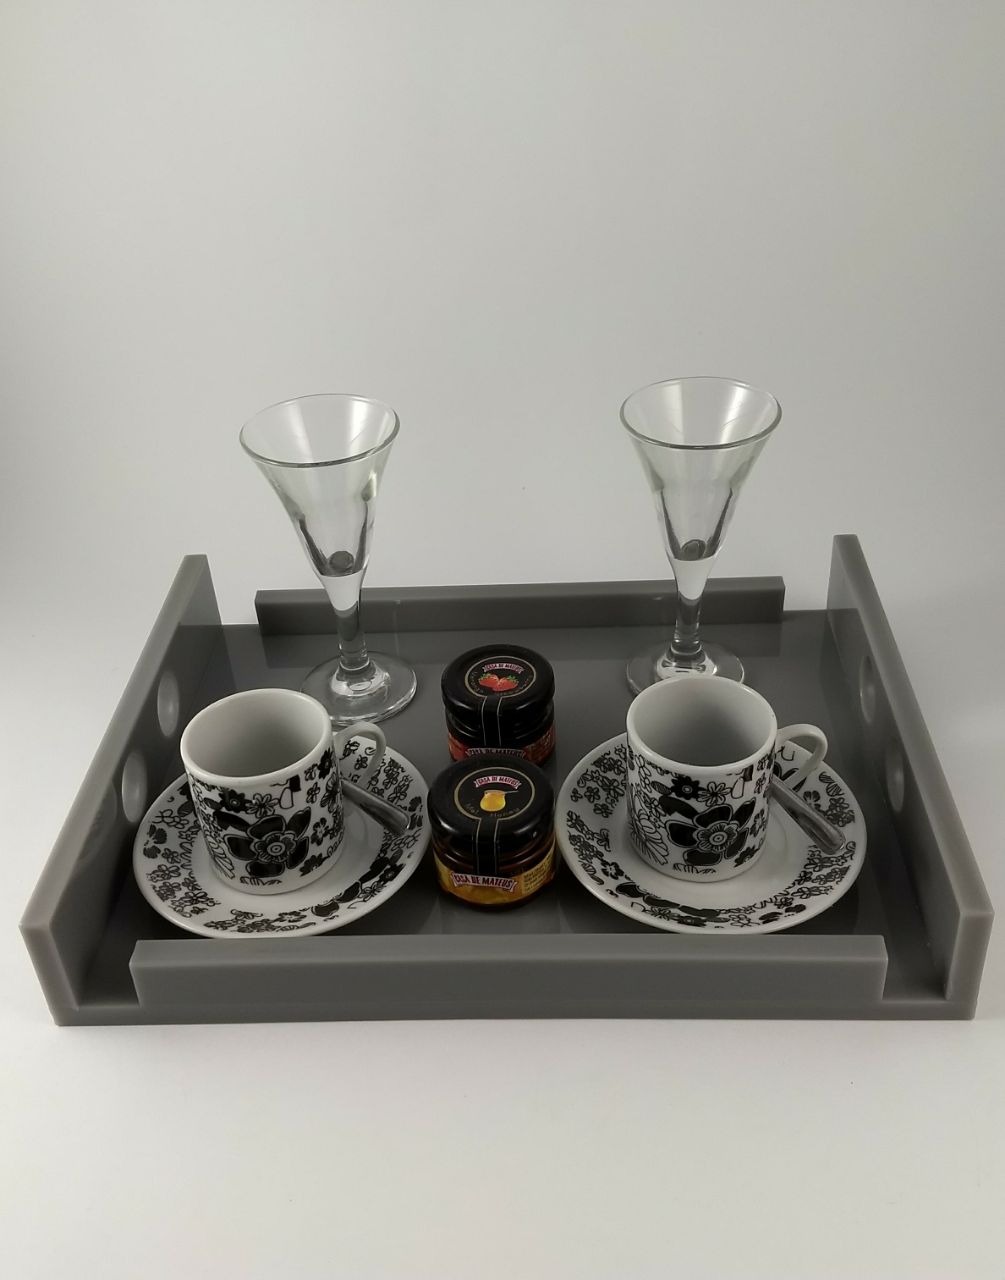 BANDEJA COFFE